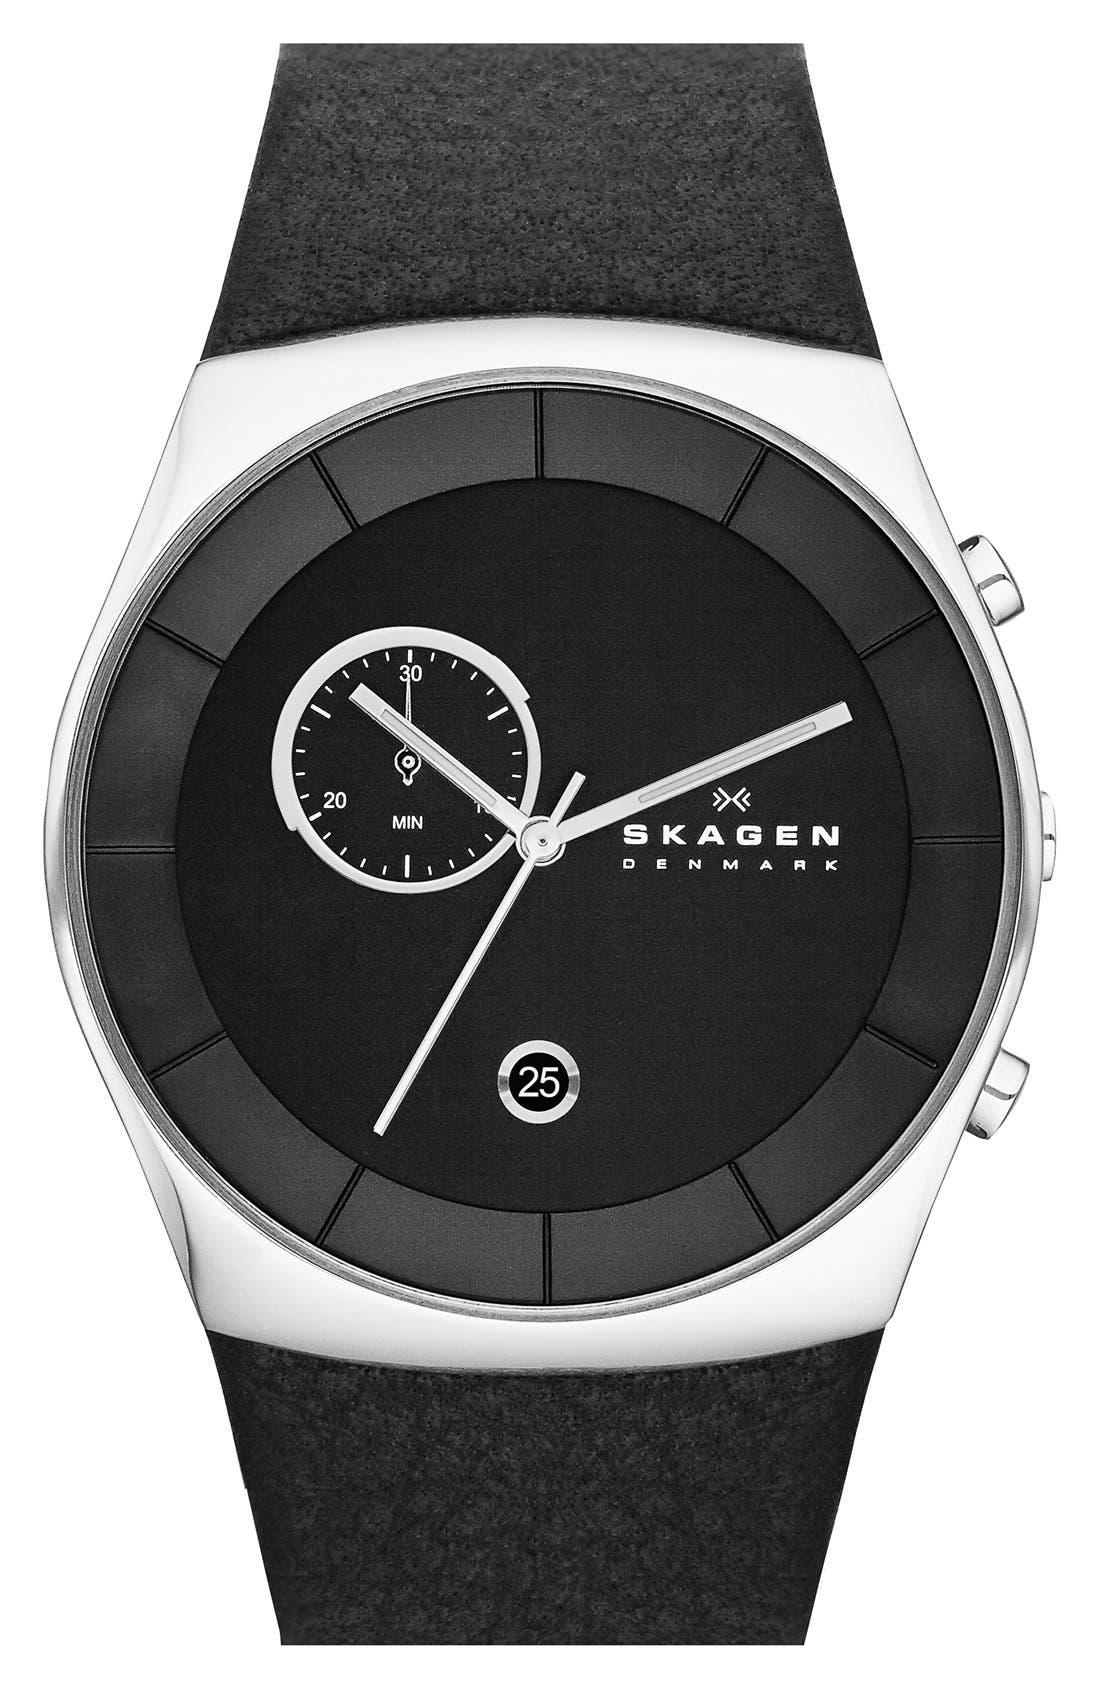 Main Image - Skagen 'Havene' Chronograph Leather Strap Watch, 42mm